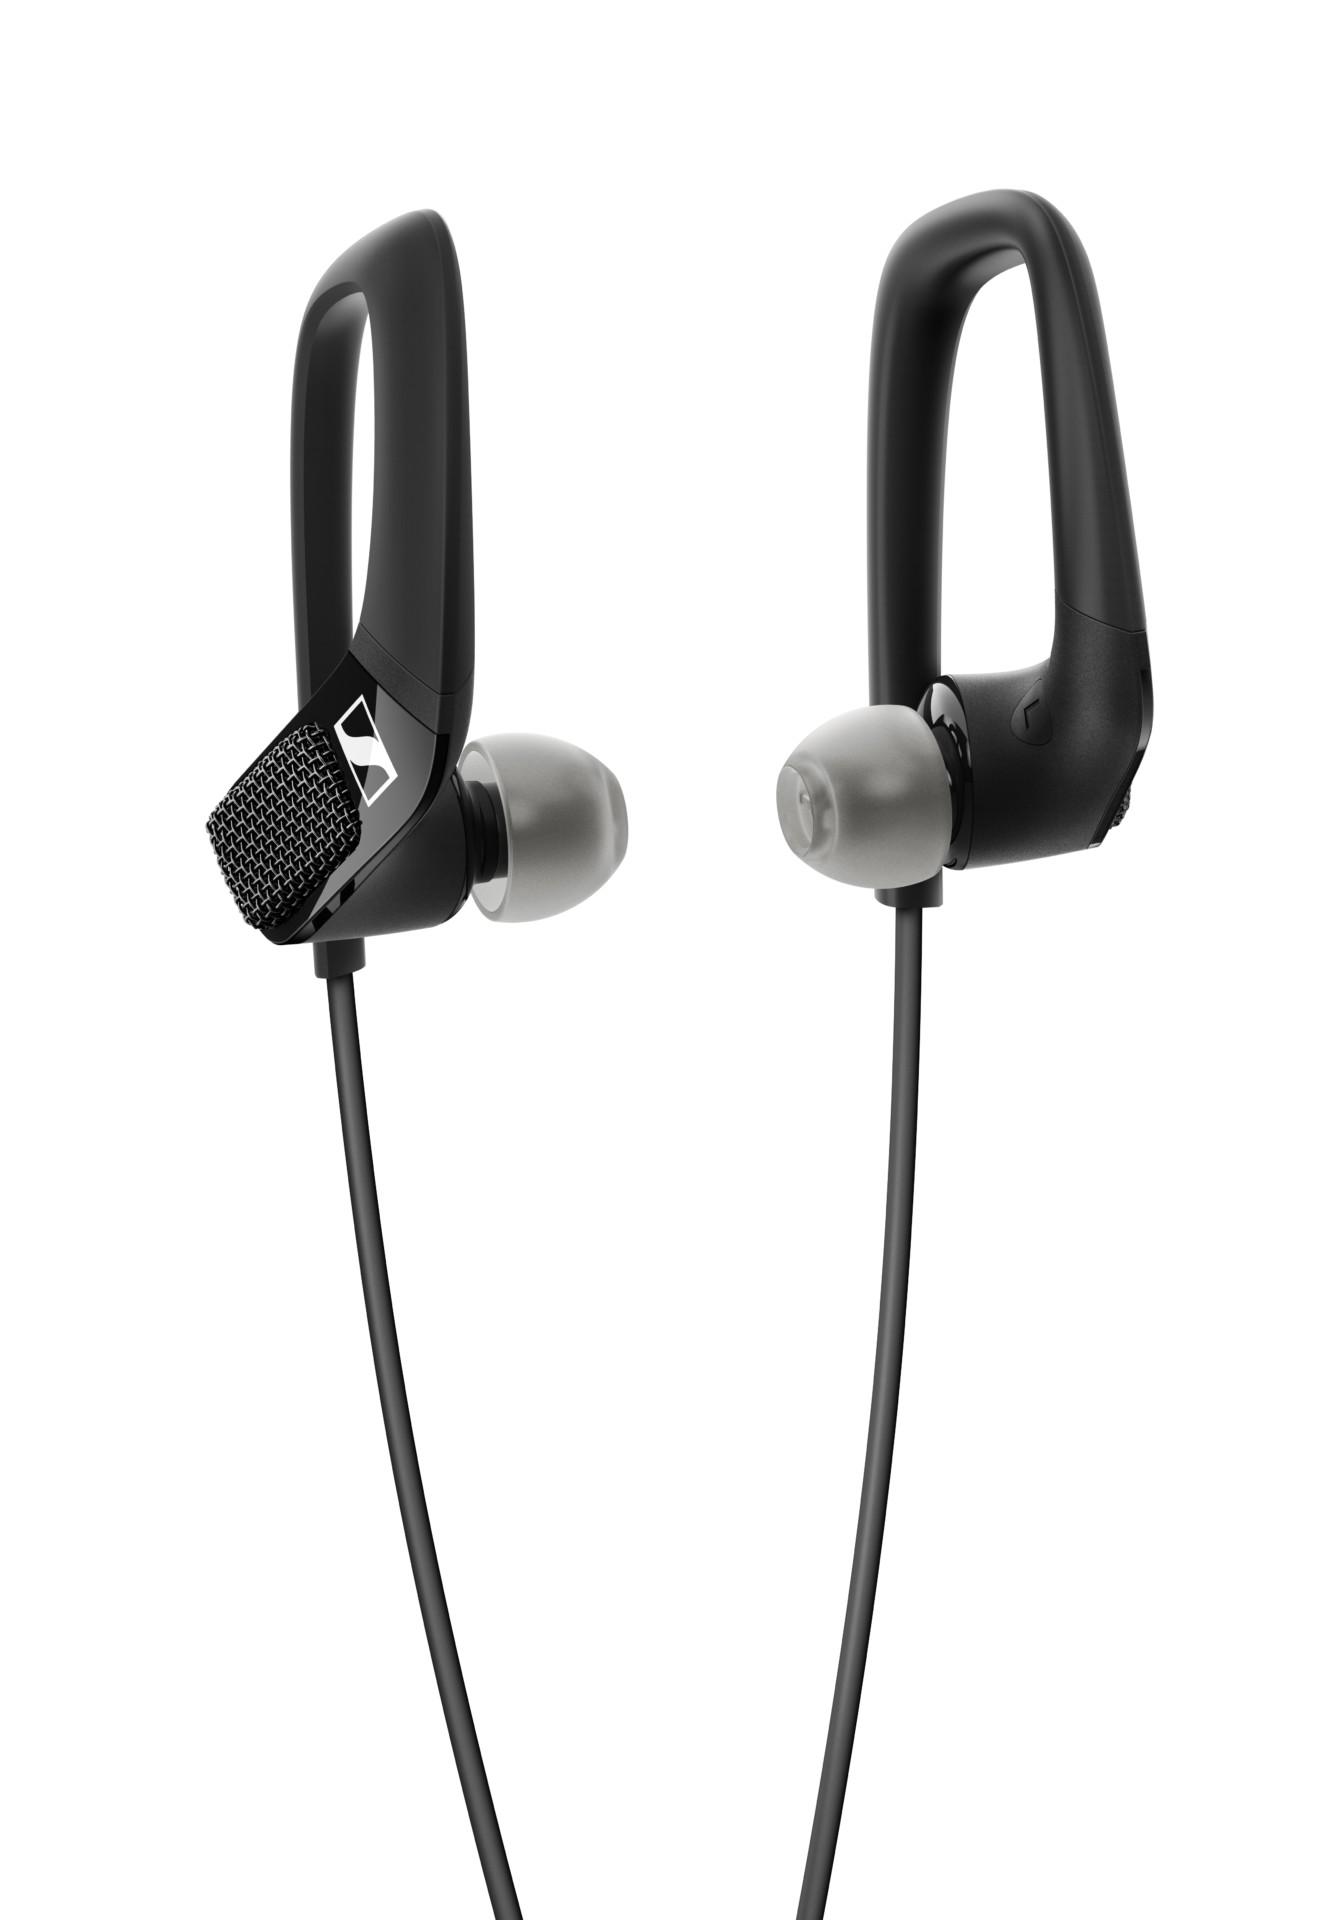 Sennheiser Ambeo AR One earphones product image on white background.